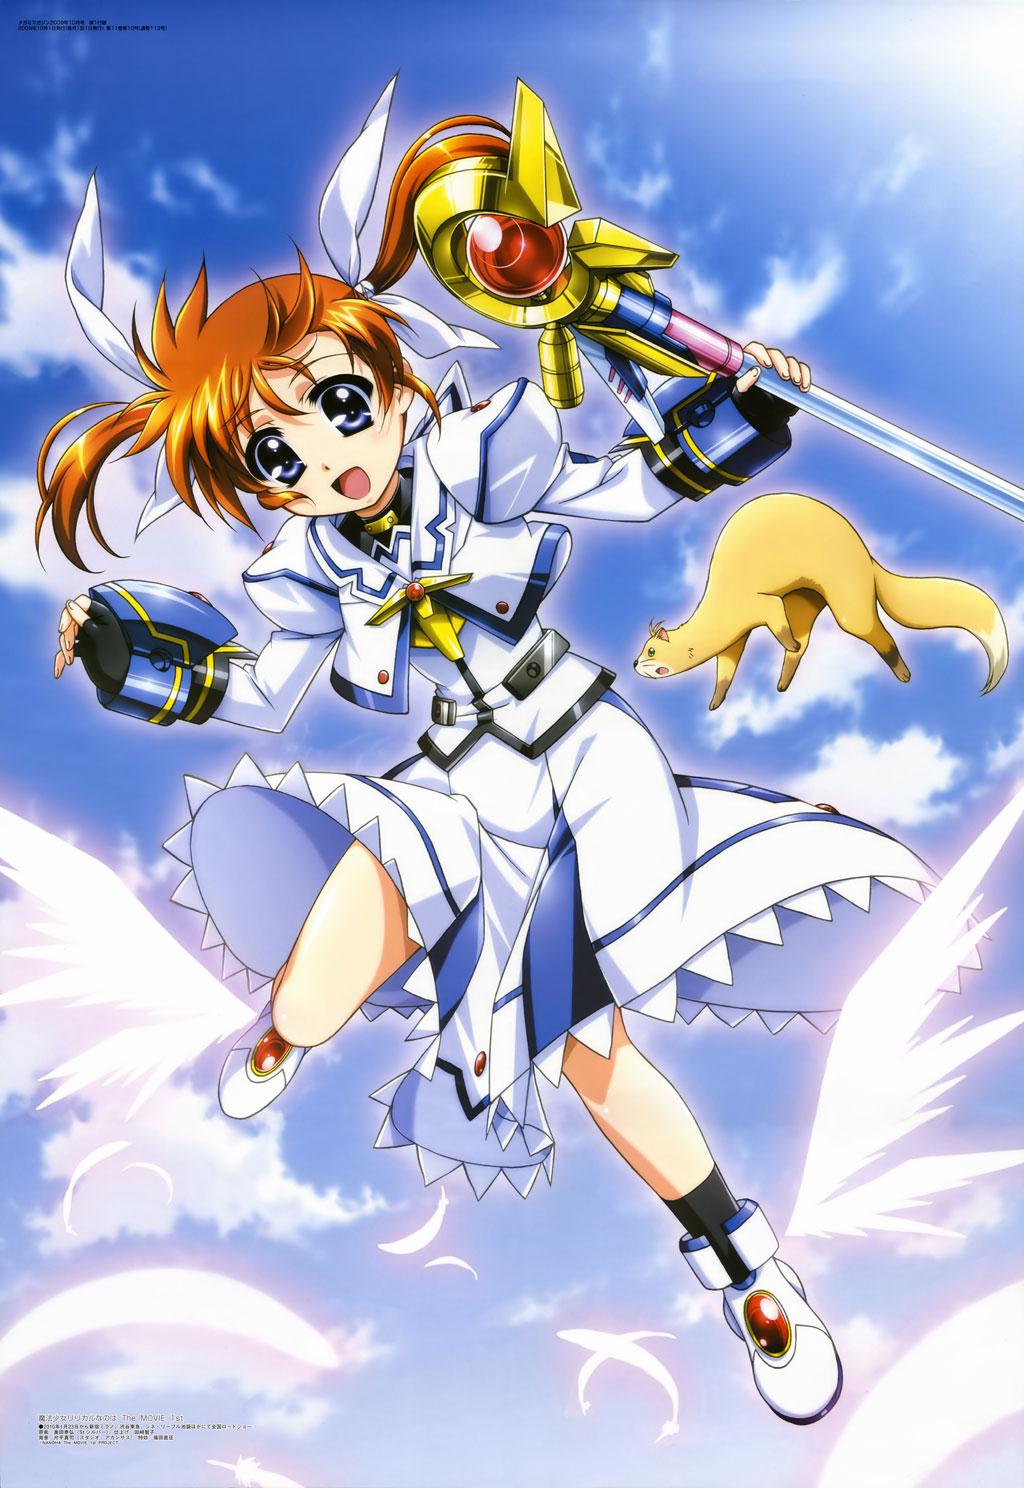 http://awtlblog.vitsco.com/wp-content/uploads/2010/05/Takamachi-Nanoha-Illustration.jpg